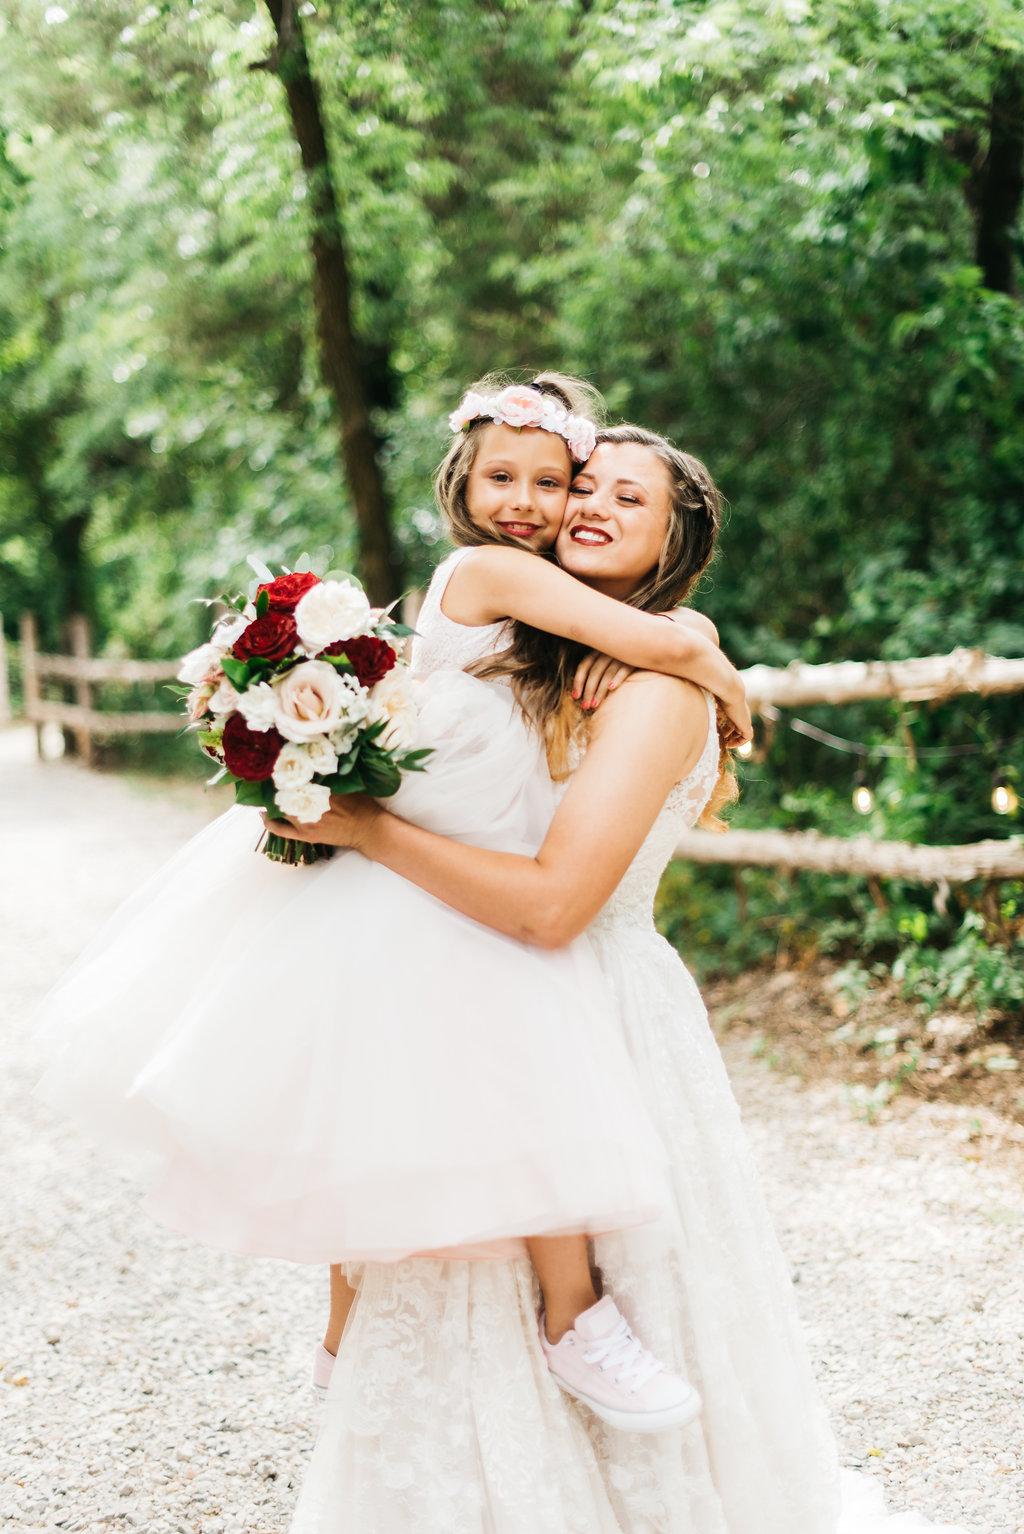 Lexi-Colby-Wedding-2285.jpg